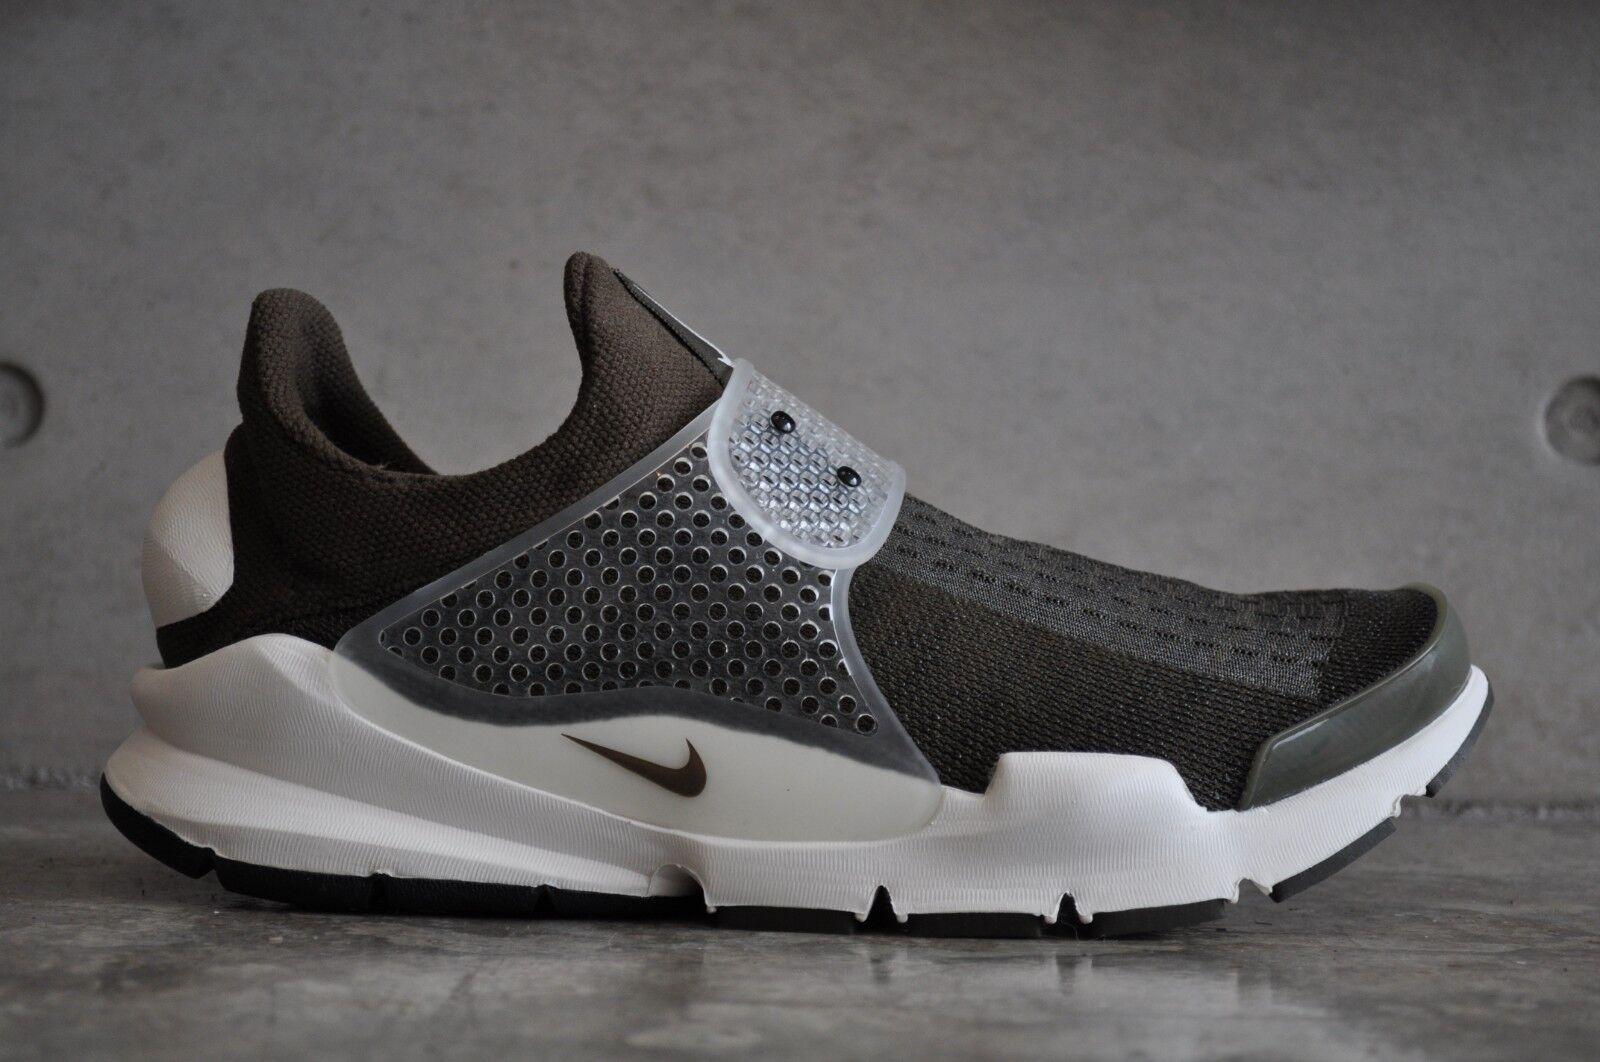 Nike SOCK Dart SP X FRAMUomoTO D'OLIVA-Dark Loden/Dark loden-VELA 6 EUR 7 US